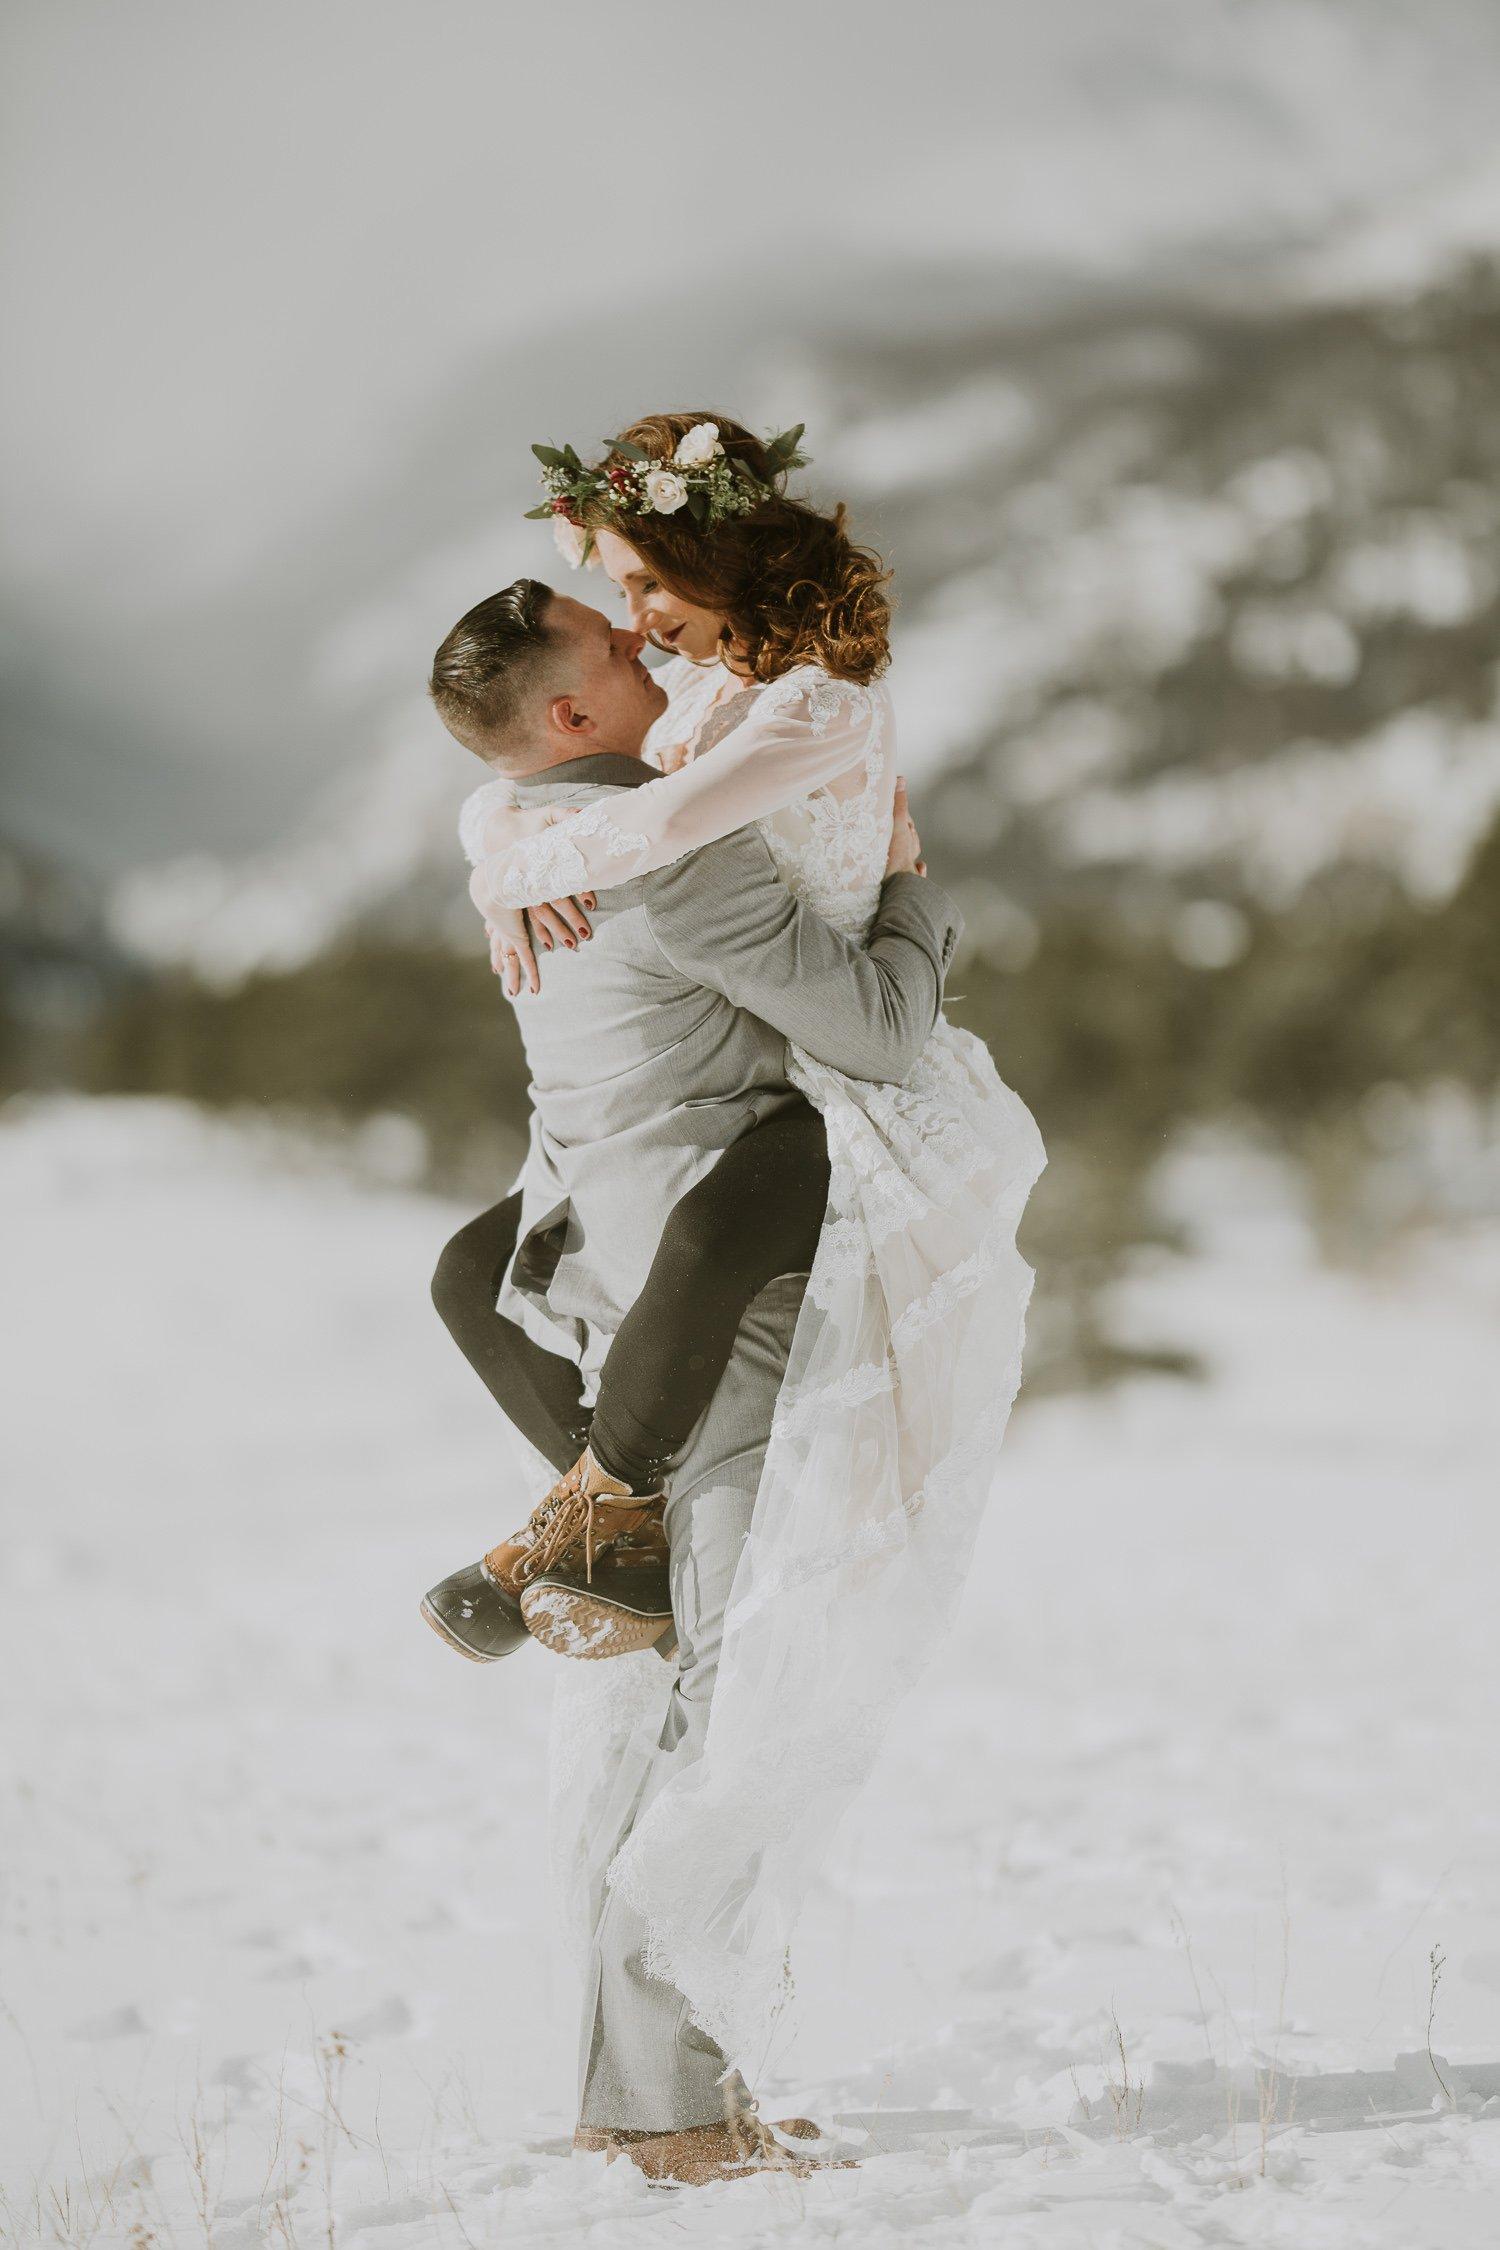 ROCKY MOUNTAIN ELOPEMENT PHOTOGRAPHY|SPRAGUE LAKE ELOPEMENT| JUSTYNA E BUTLER PHOTOGRAPHY | ROCKY MOUNTAIN NATIONAL PARK ENGAGEMENT |COLORADO MOUNTAIN ENGAGEMENT PHOTOGRAPHER